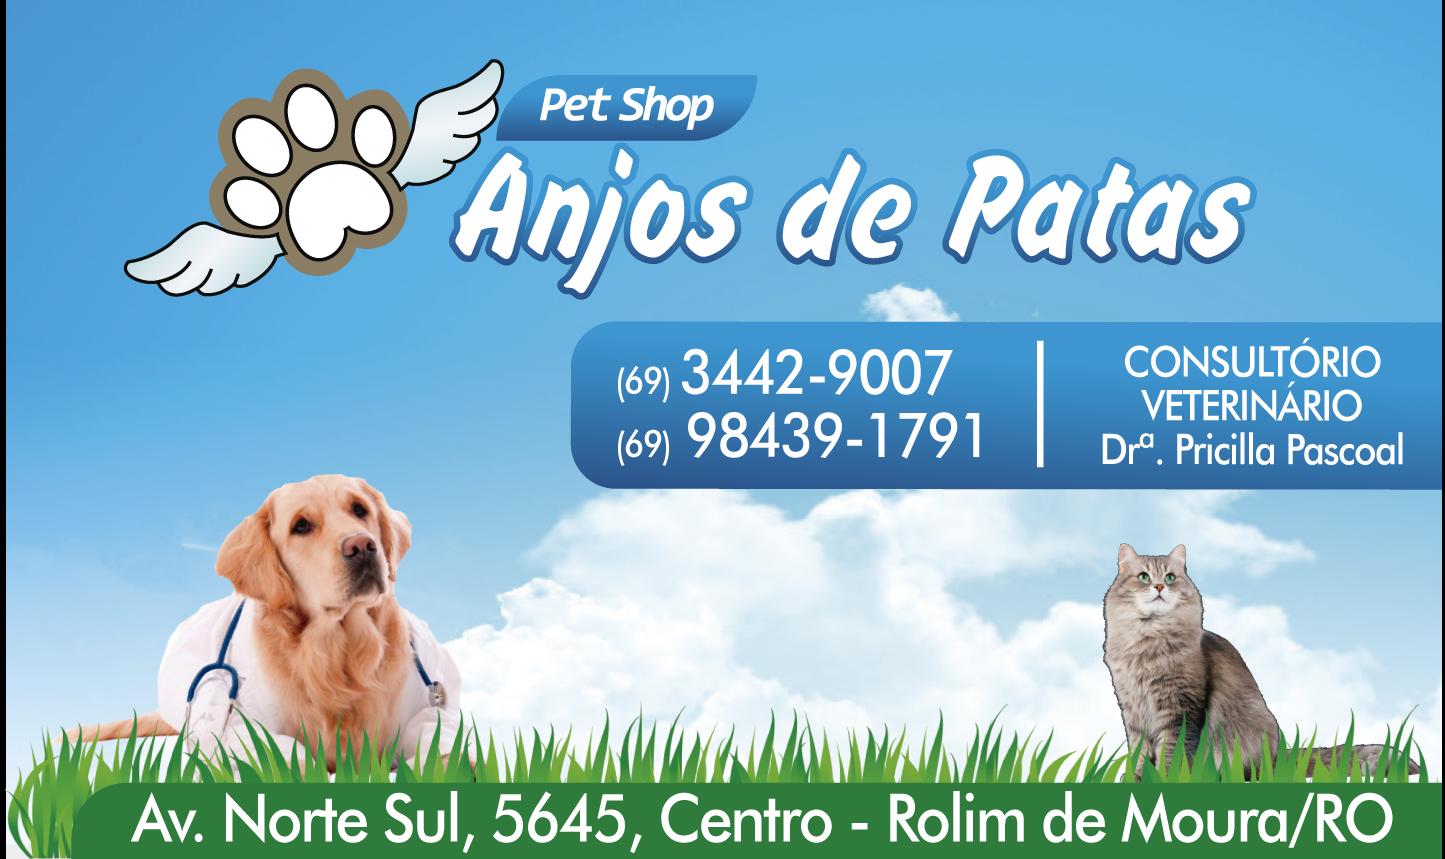 Pet Shop Anjos de Patas 2